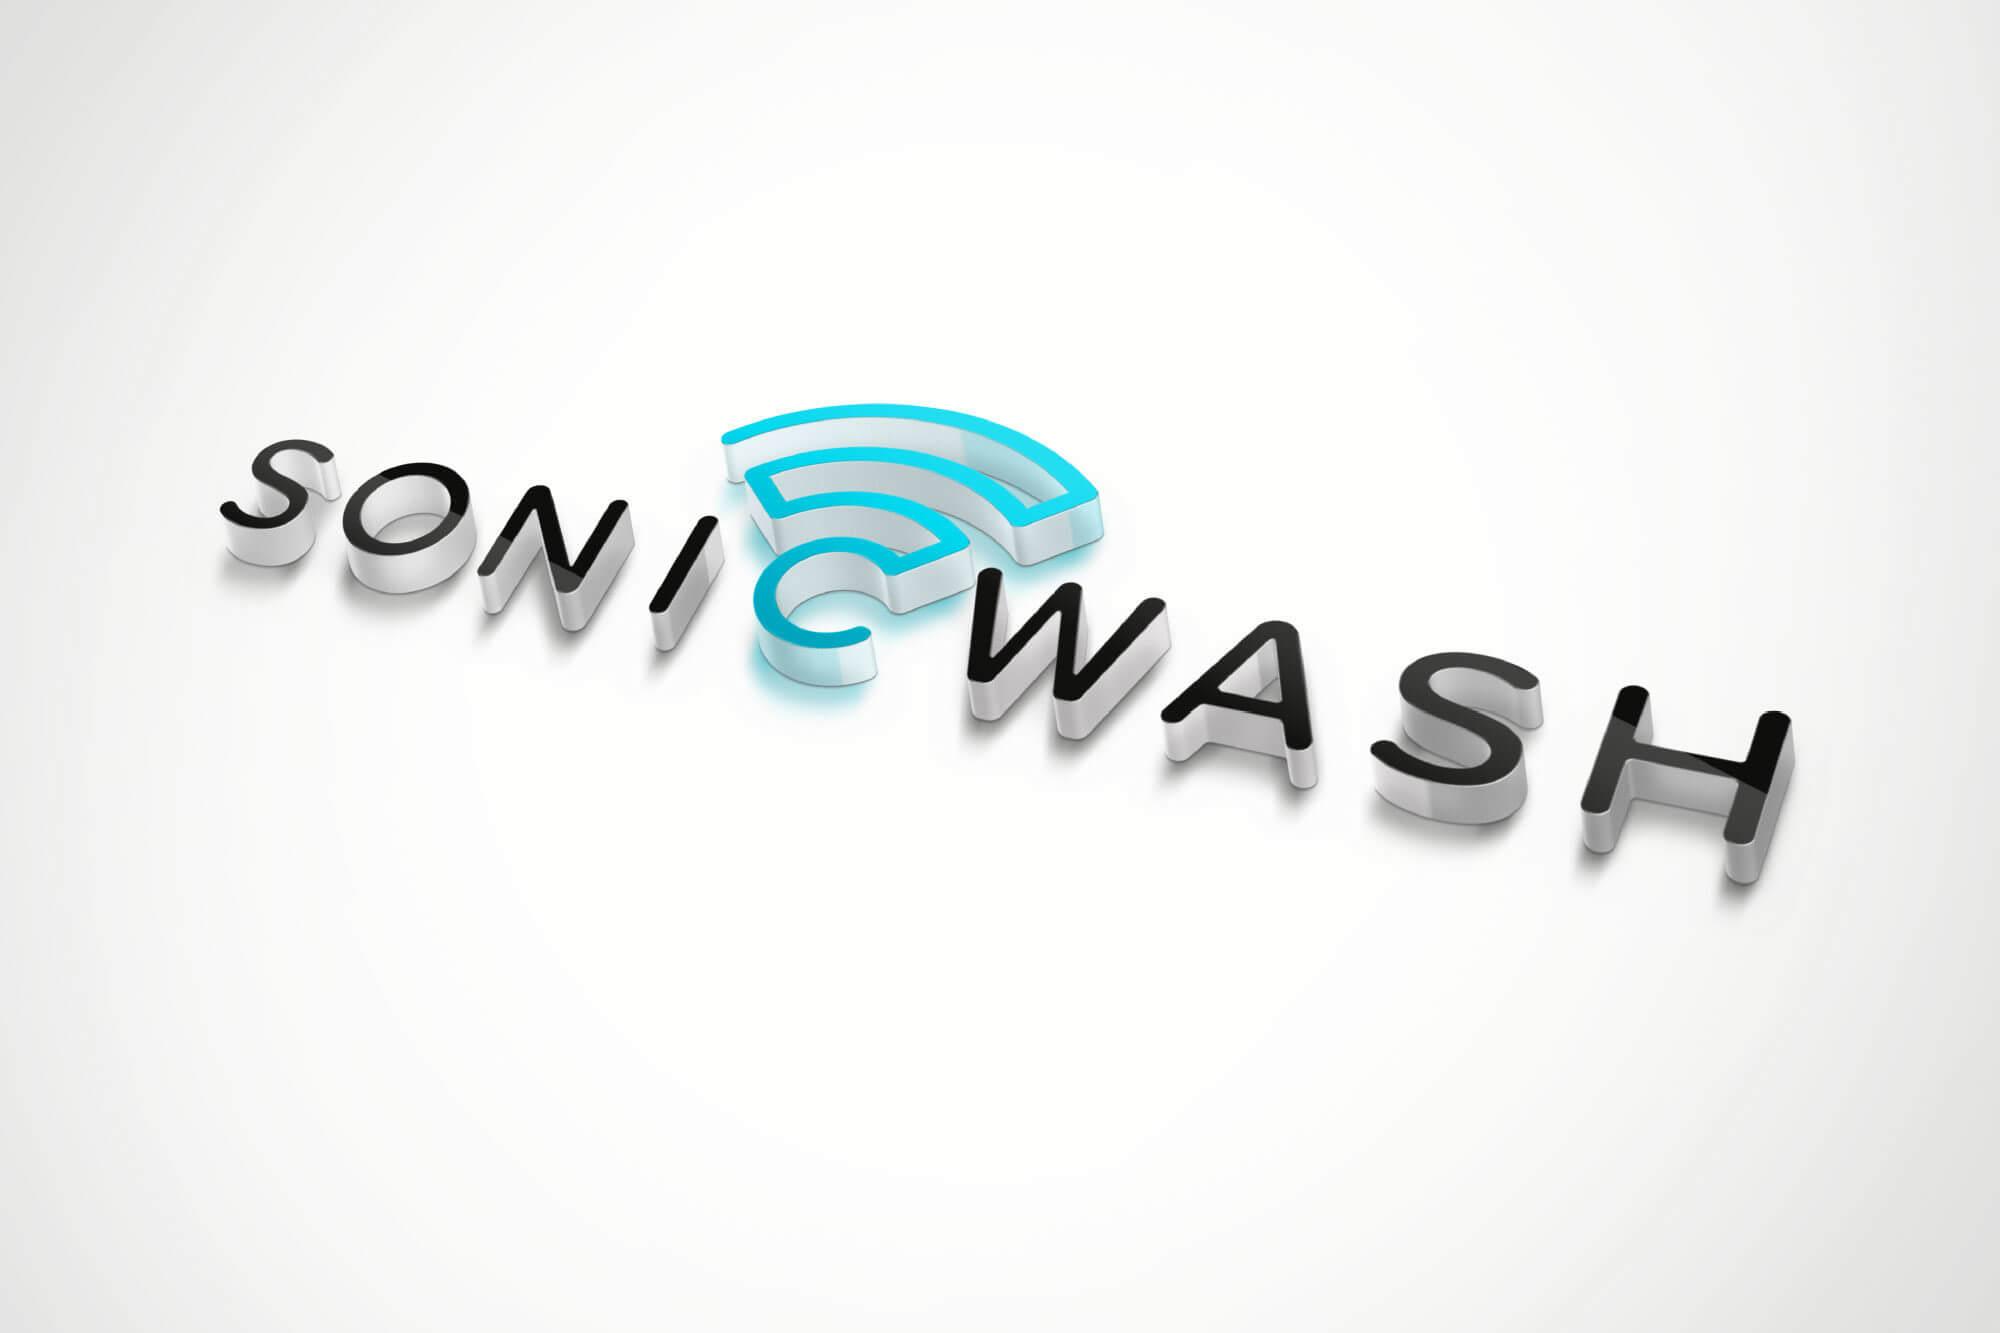 Sonicwash logo